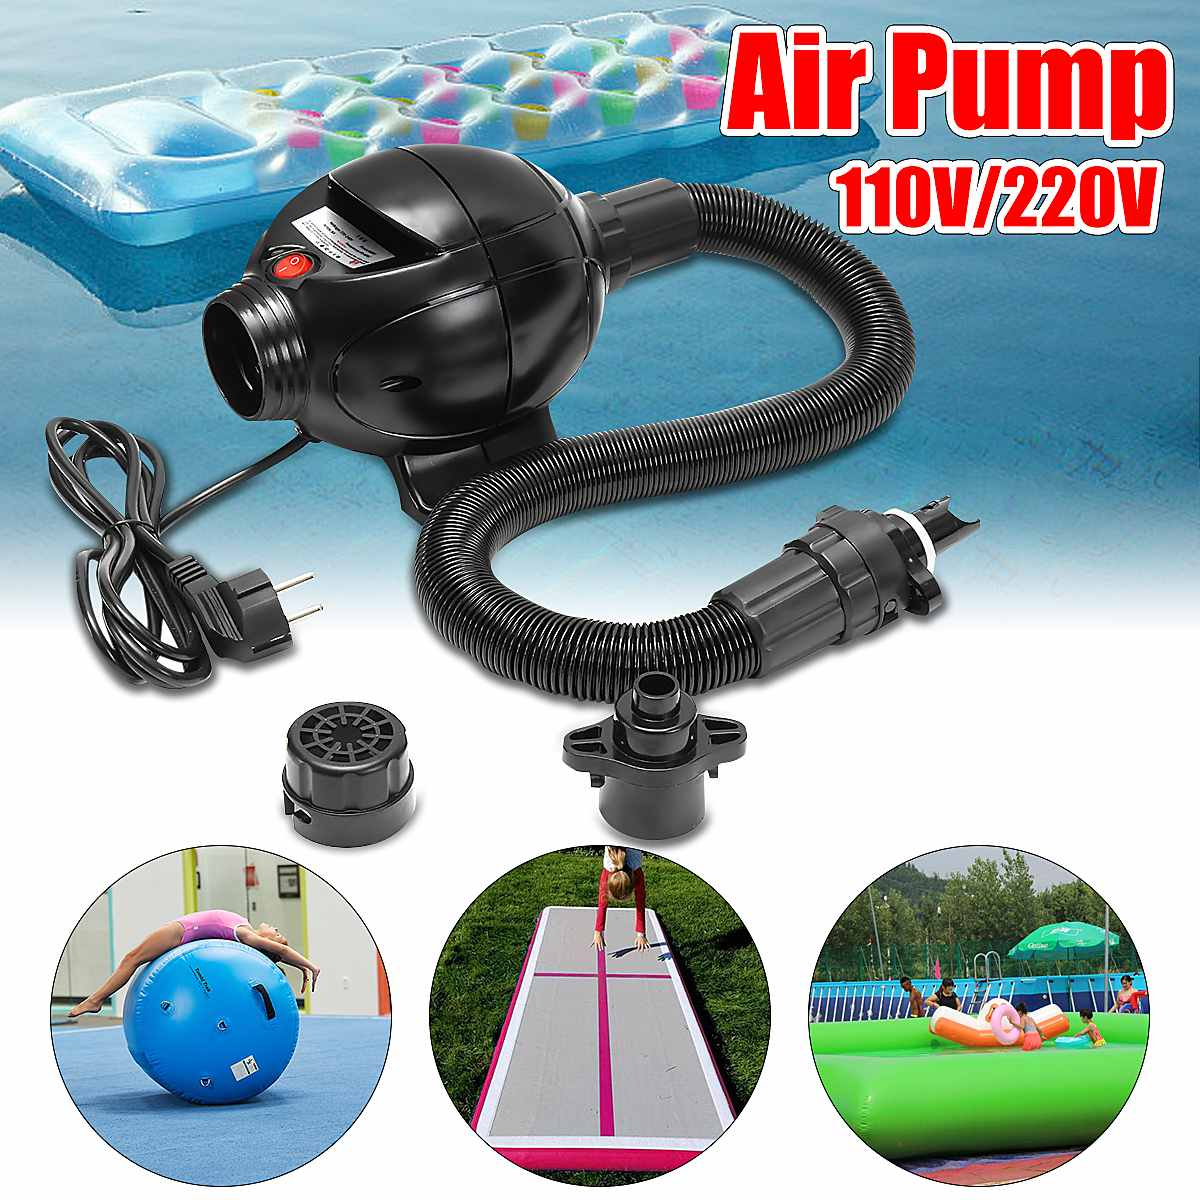 110V/220V Electric Air Pump For Air Track Inflatable Home Gymnastics Tumbling Mat